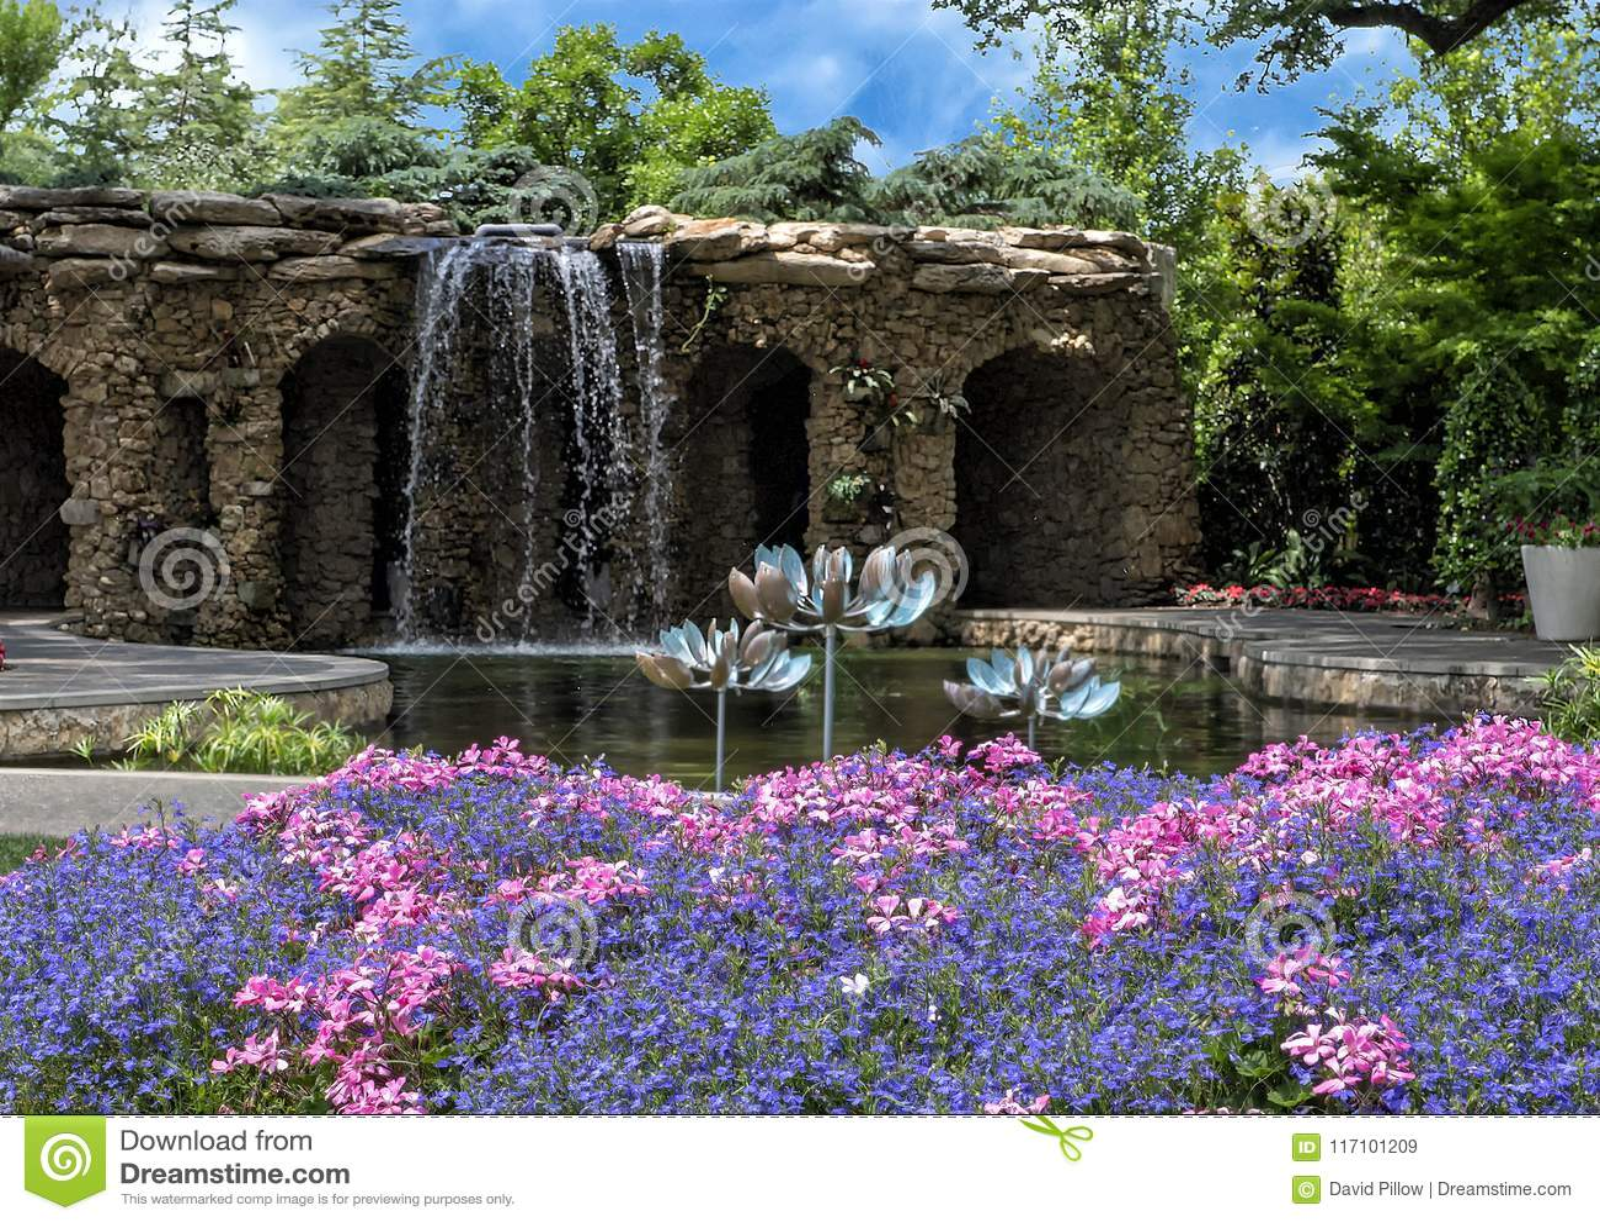 Lay Family Garden At The Dallas Arboretum Editorial Stock Image